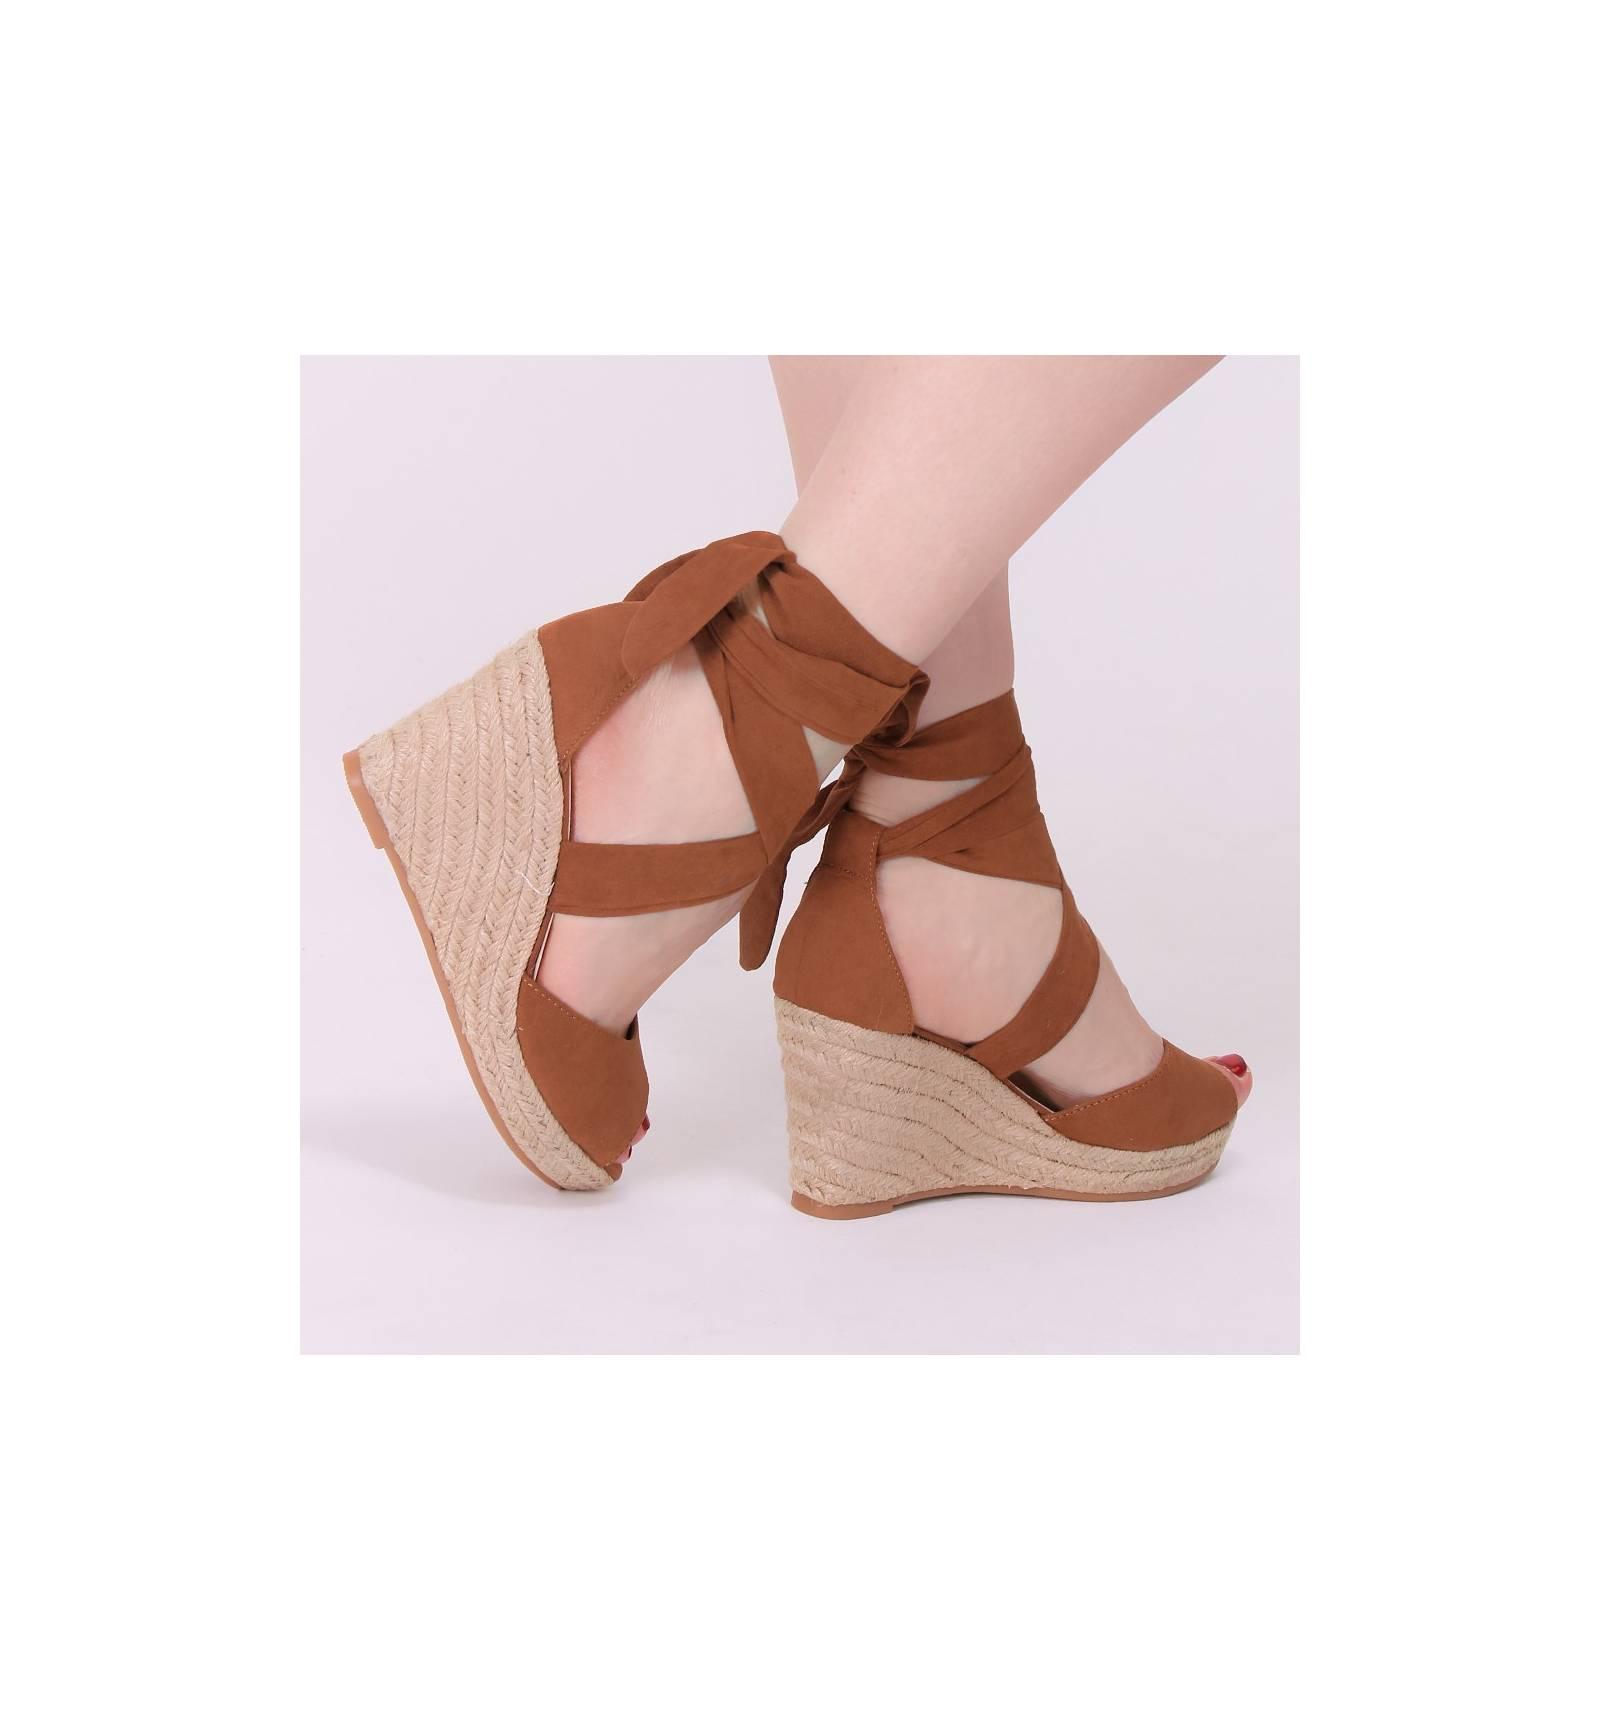 on feet shots of nice shoes price reduced Espadrilles femme daim talon corde compensée camel ruban ...